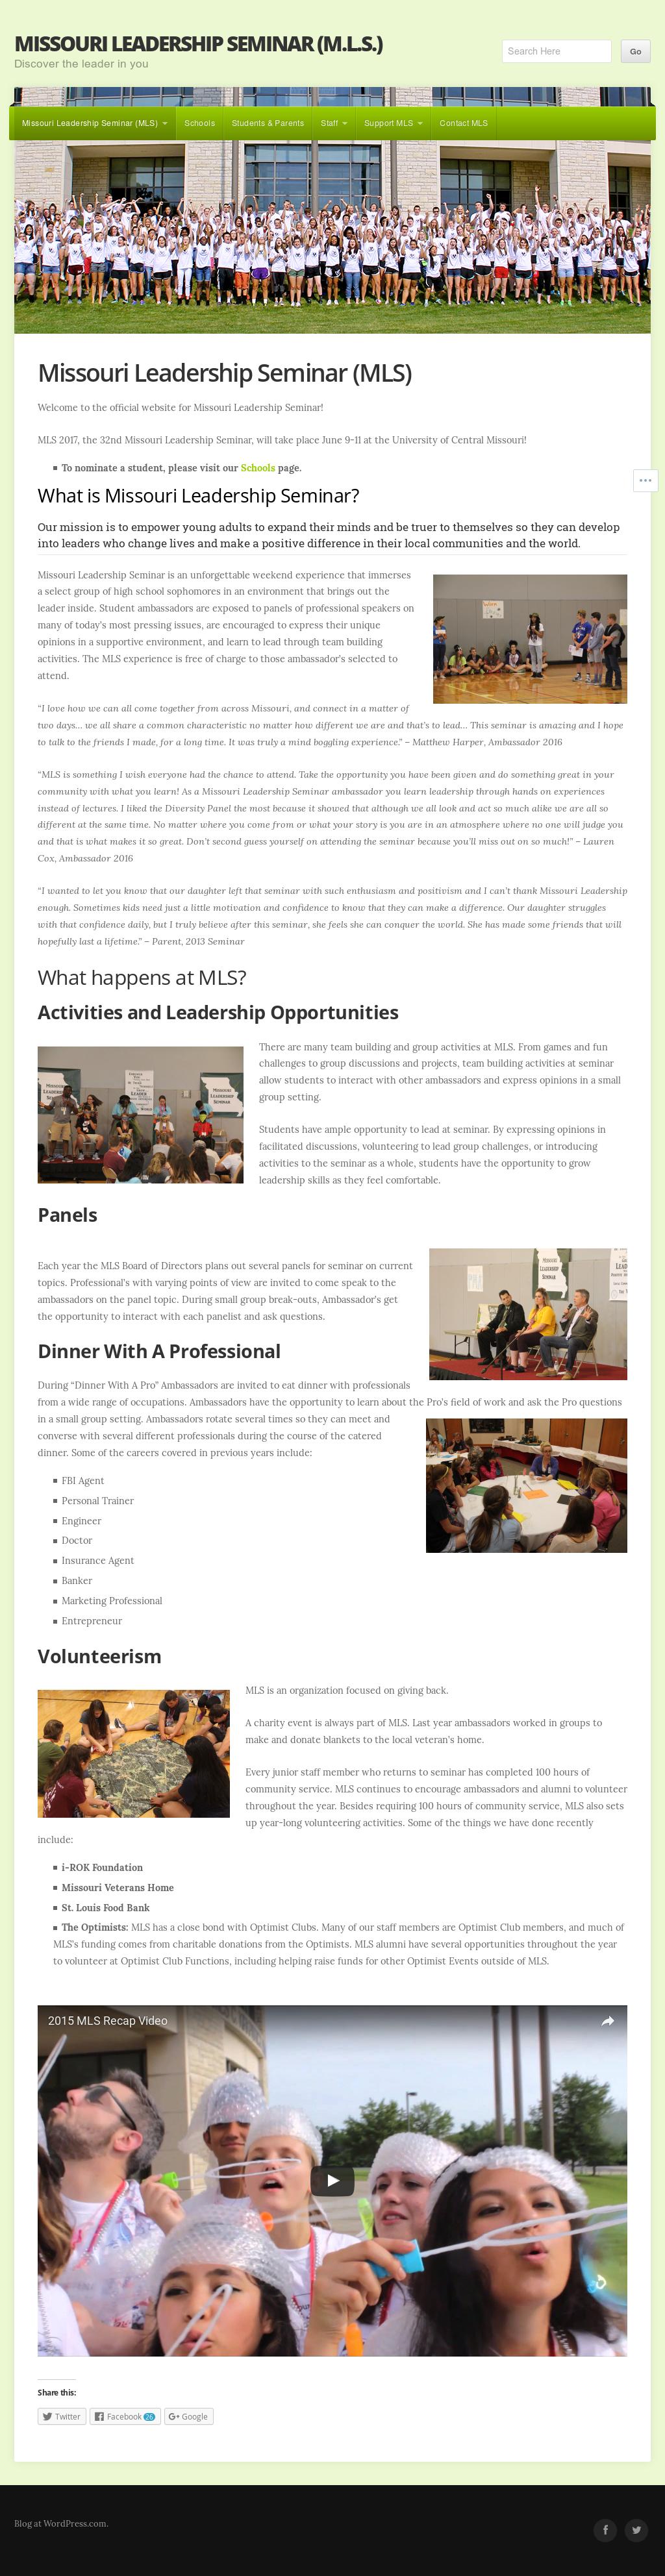 Missouri Leadership Seminar Inc Mls Website History